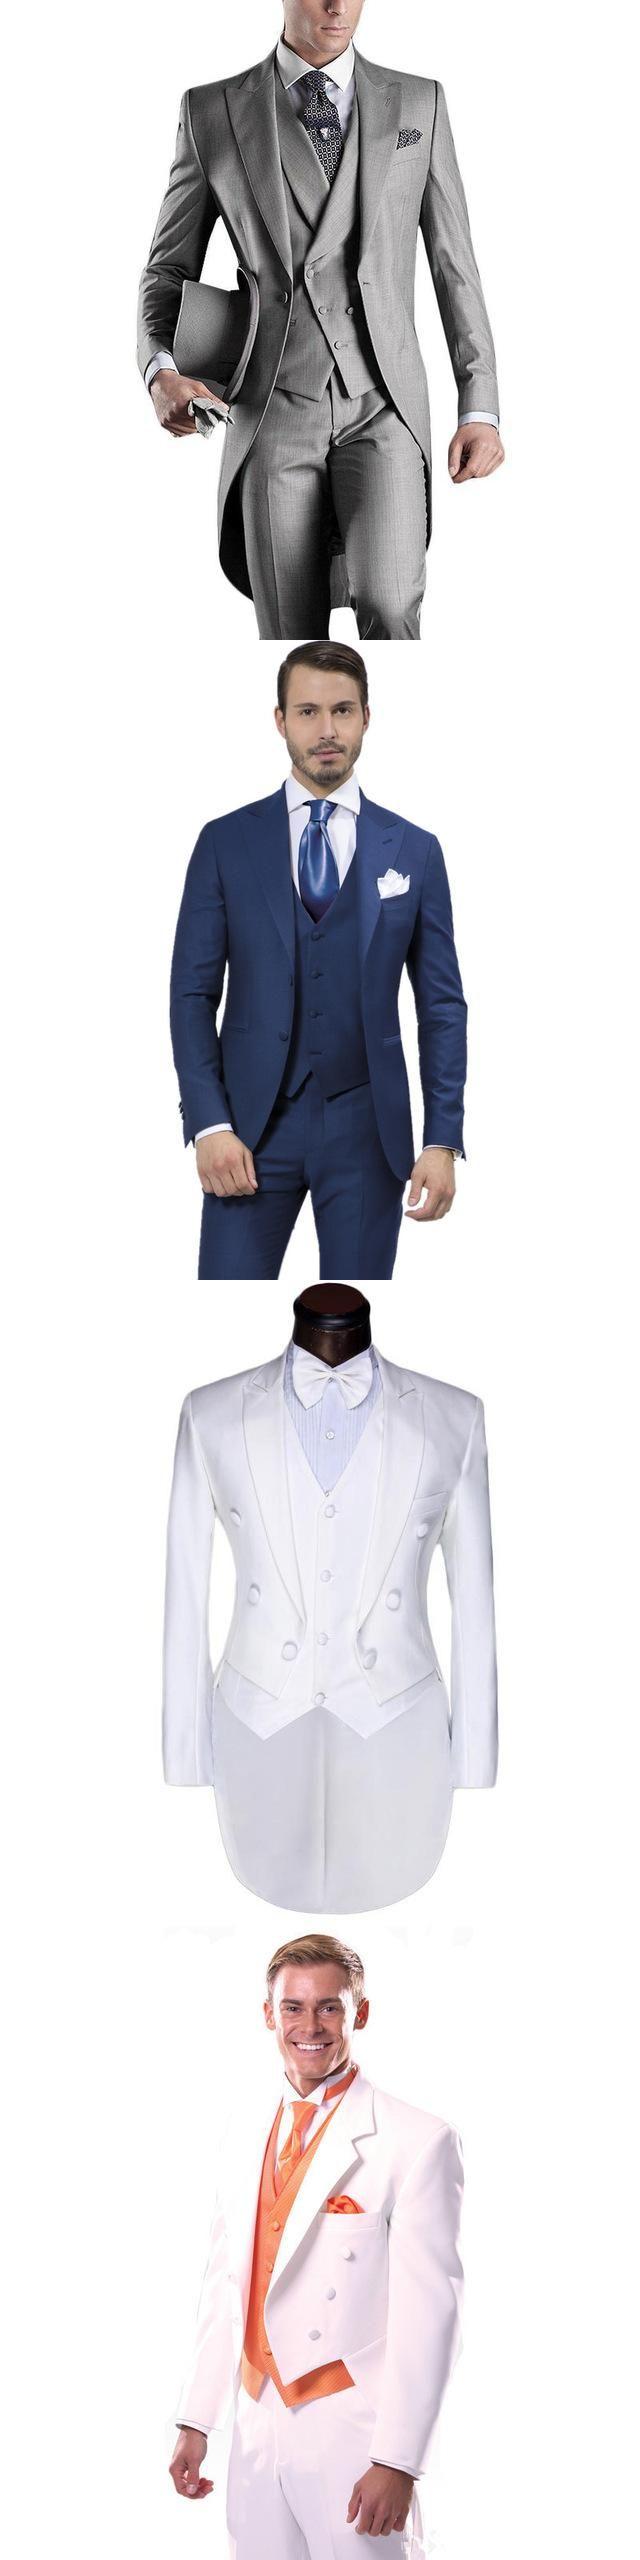 New Arrival Italian Men Tailcoat Blue Wedding Suits For Groomsmen 3pieces Groom Peaked